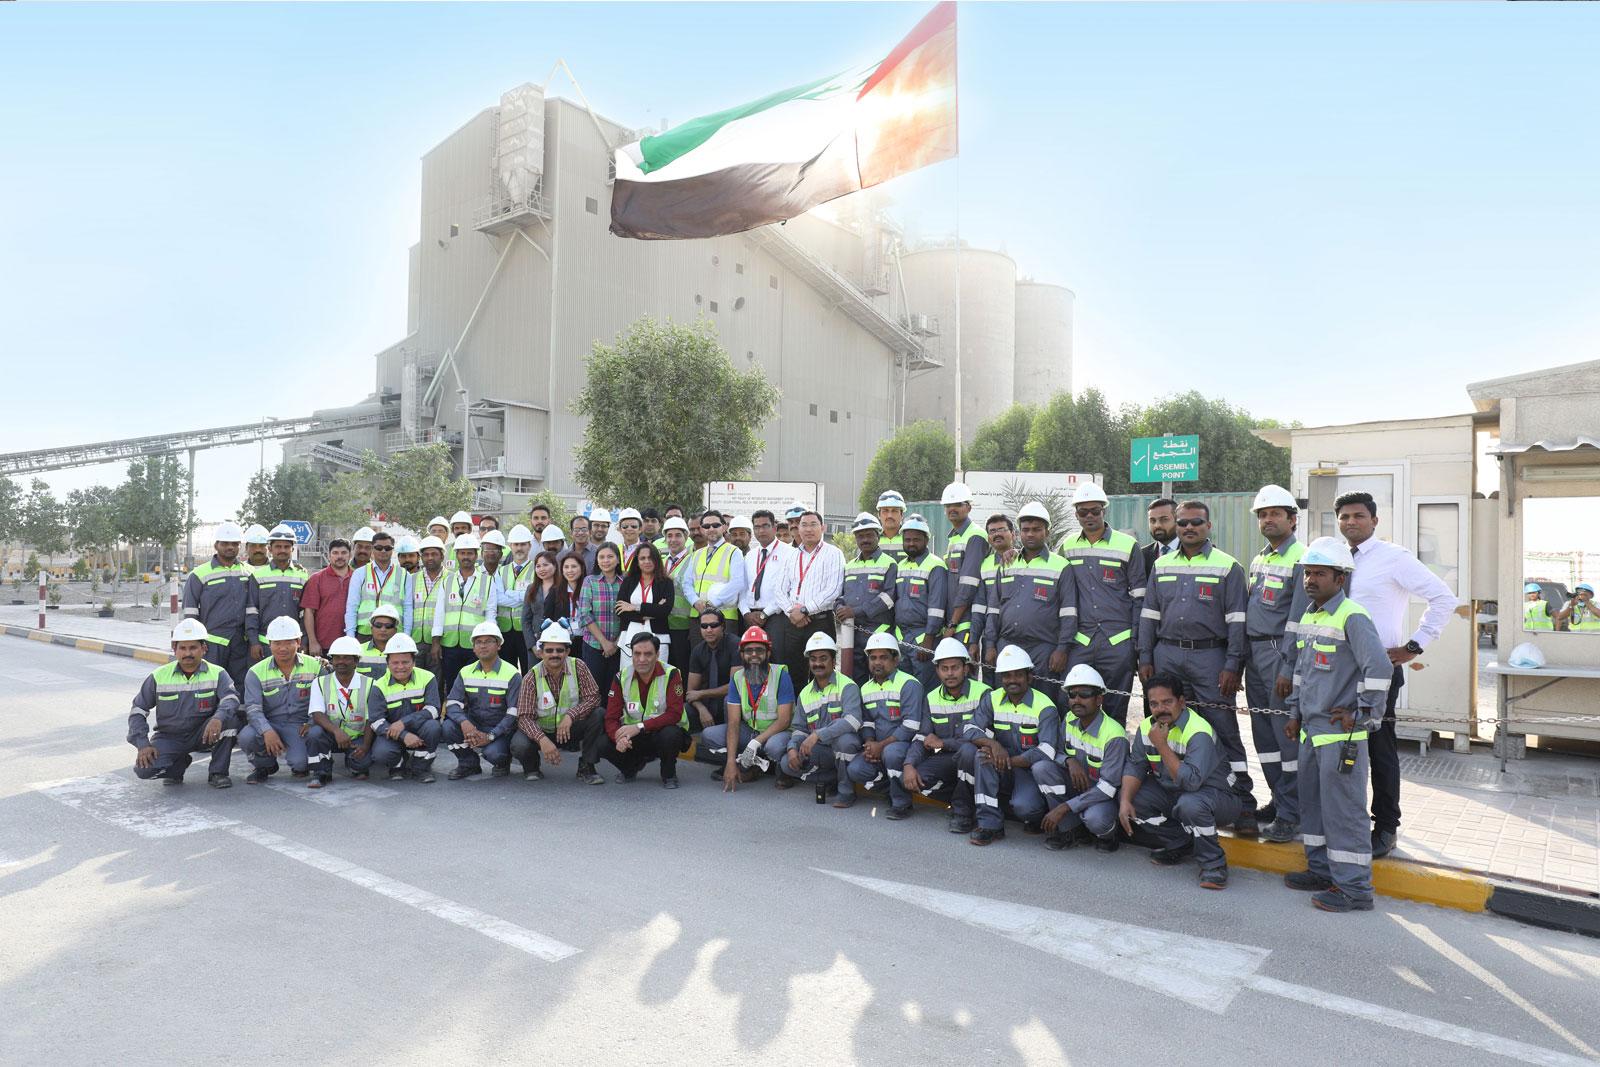 National Cement Factory – NATIONAL CEMENT FACTORY